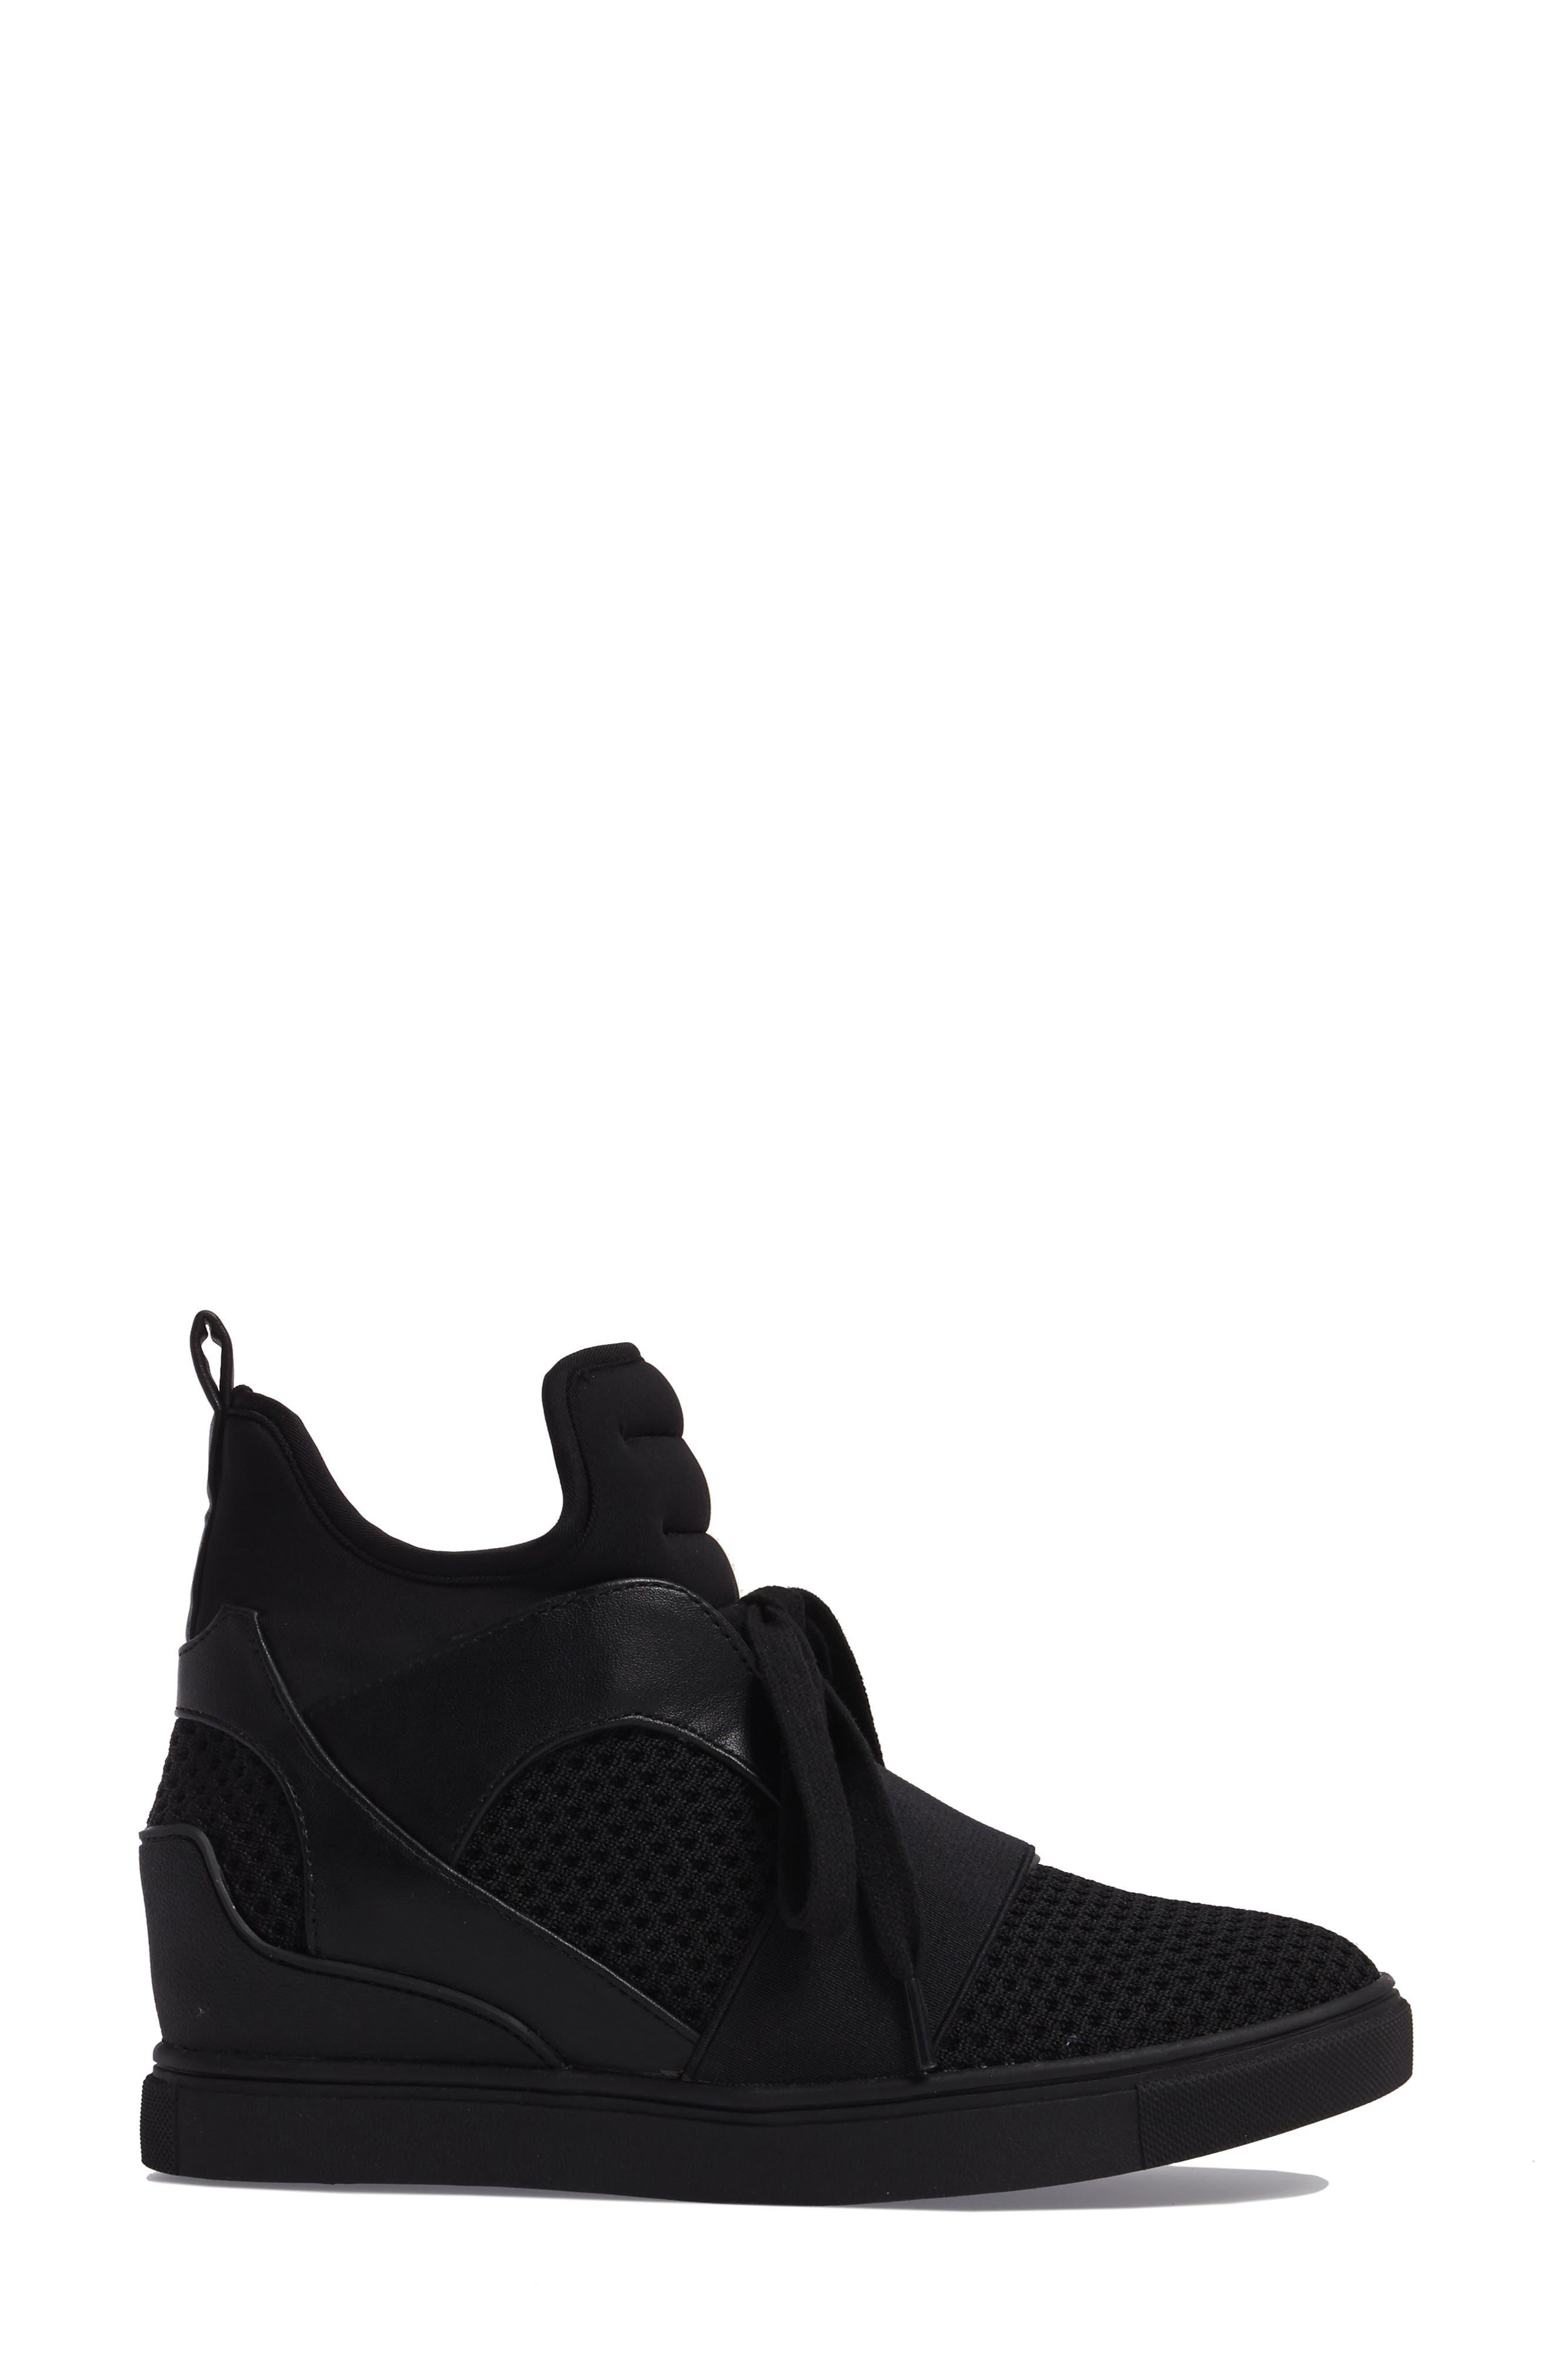 Lexie Wedge Sneaker,                             Alternate thumbnail 3, color,                             001